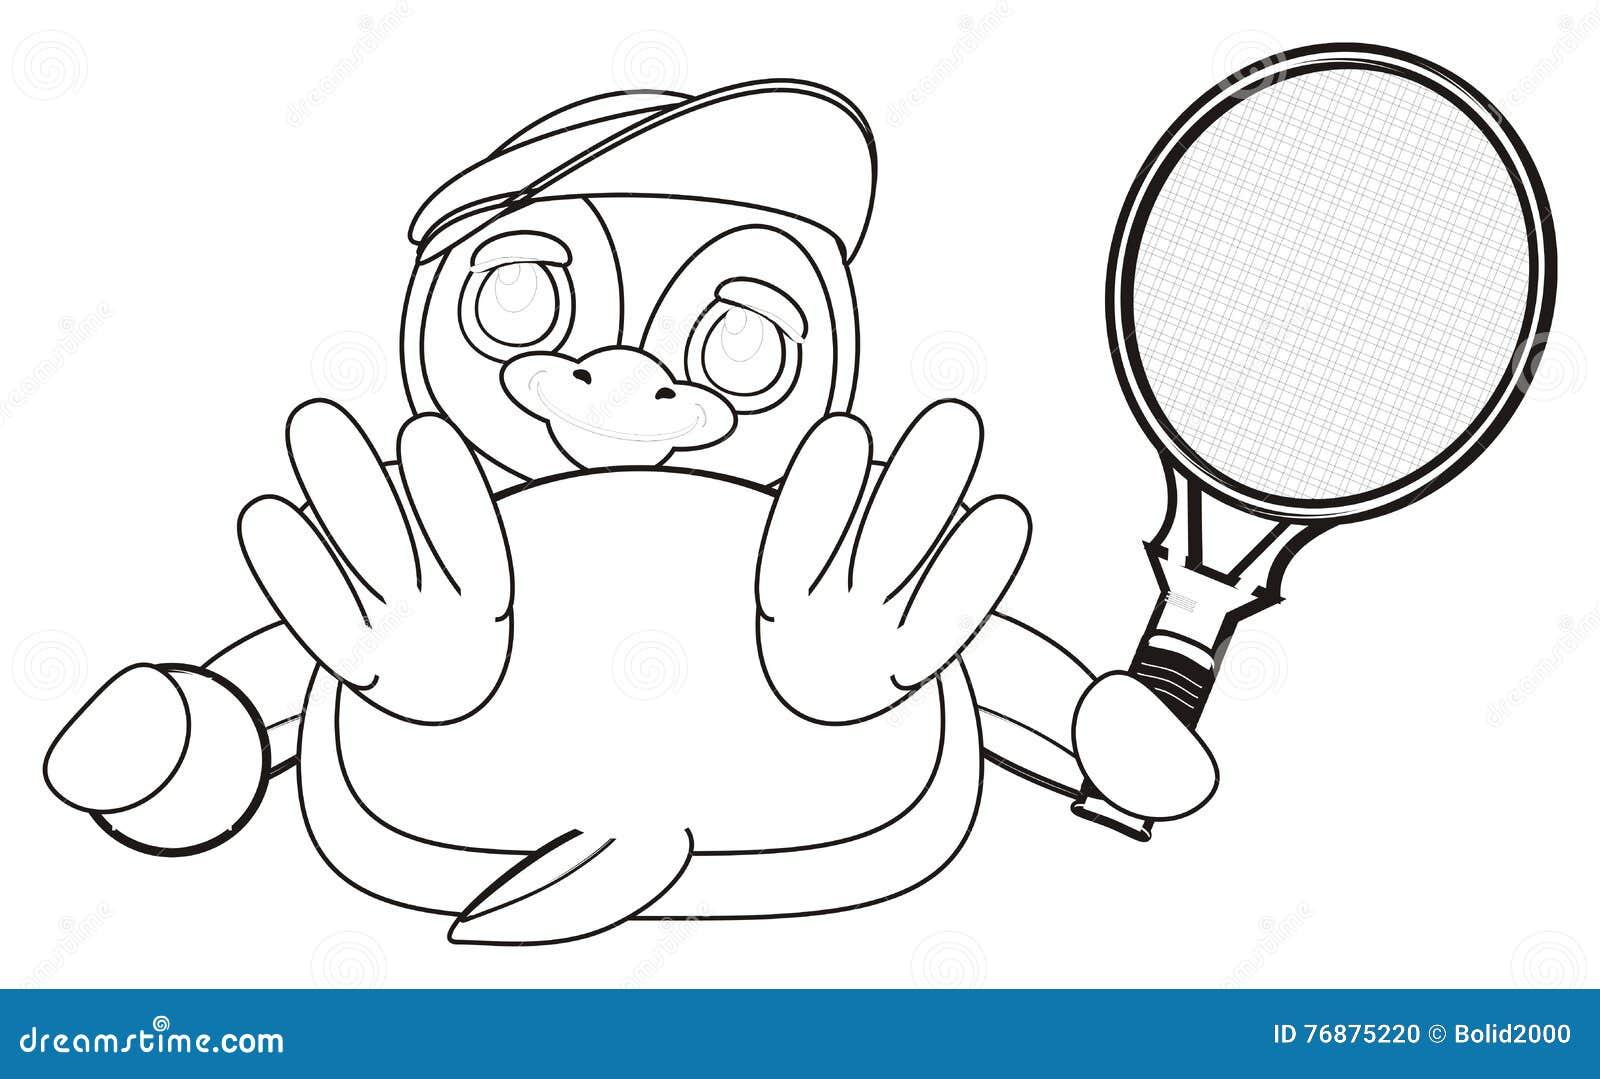 Tenis pelota stock de ilustracion ilustracion libre de stock de - Ping Ino Del Colorante Con La Pelota De Tenis Y La Estafa Stock De Ilustraci N